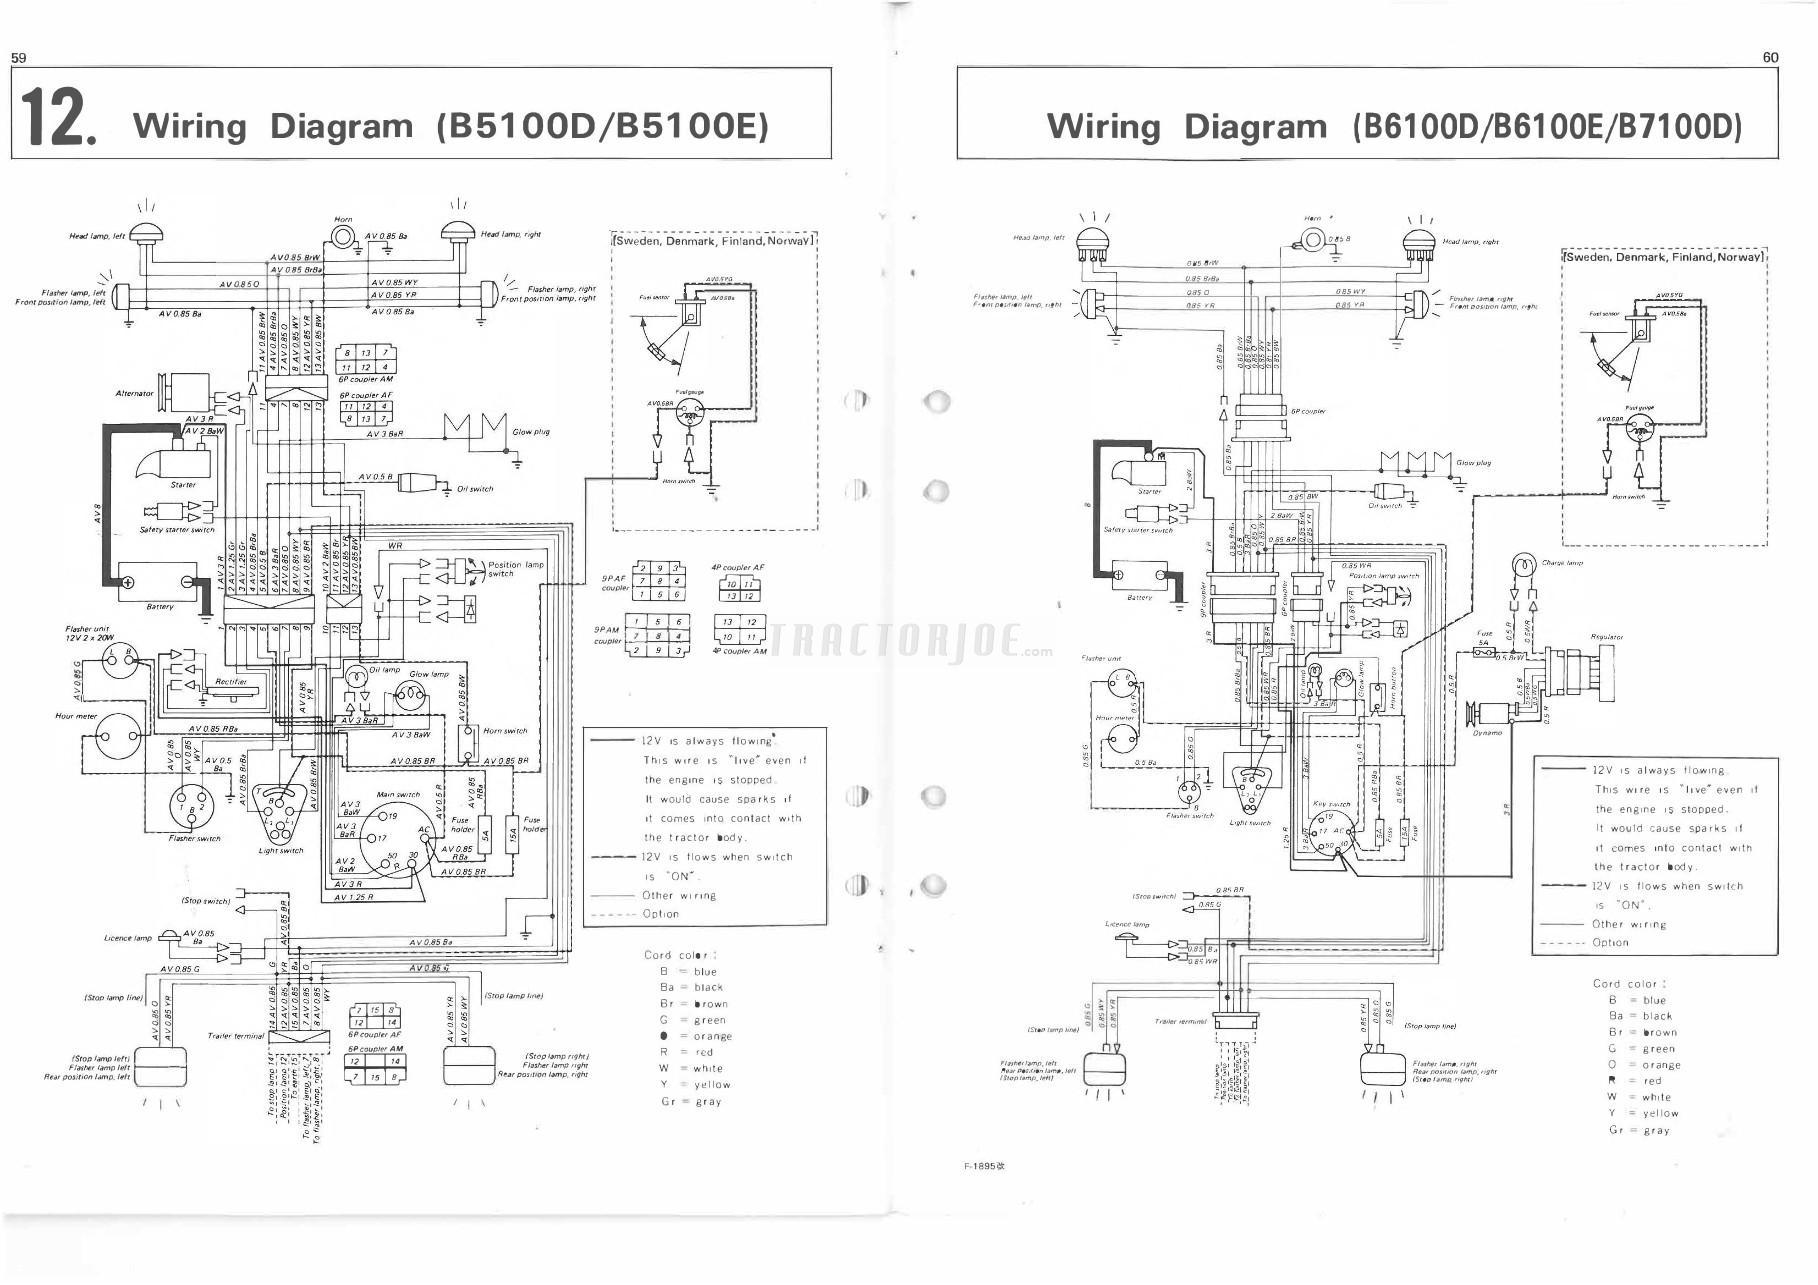 On Line Kubota B5100e Wiring Diagram